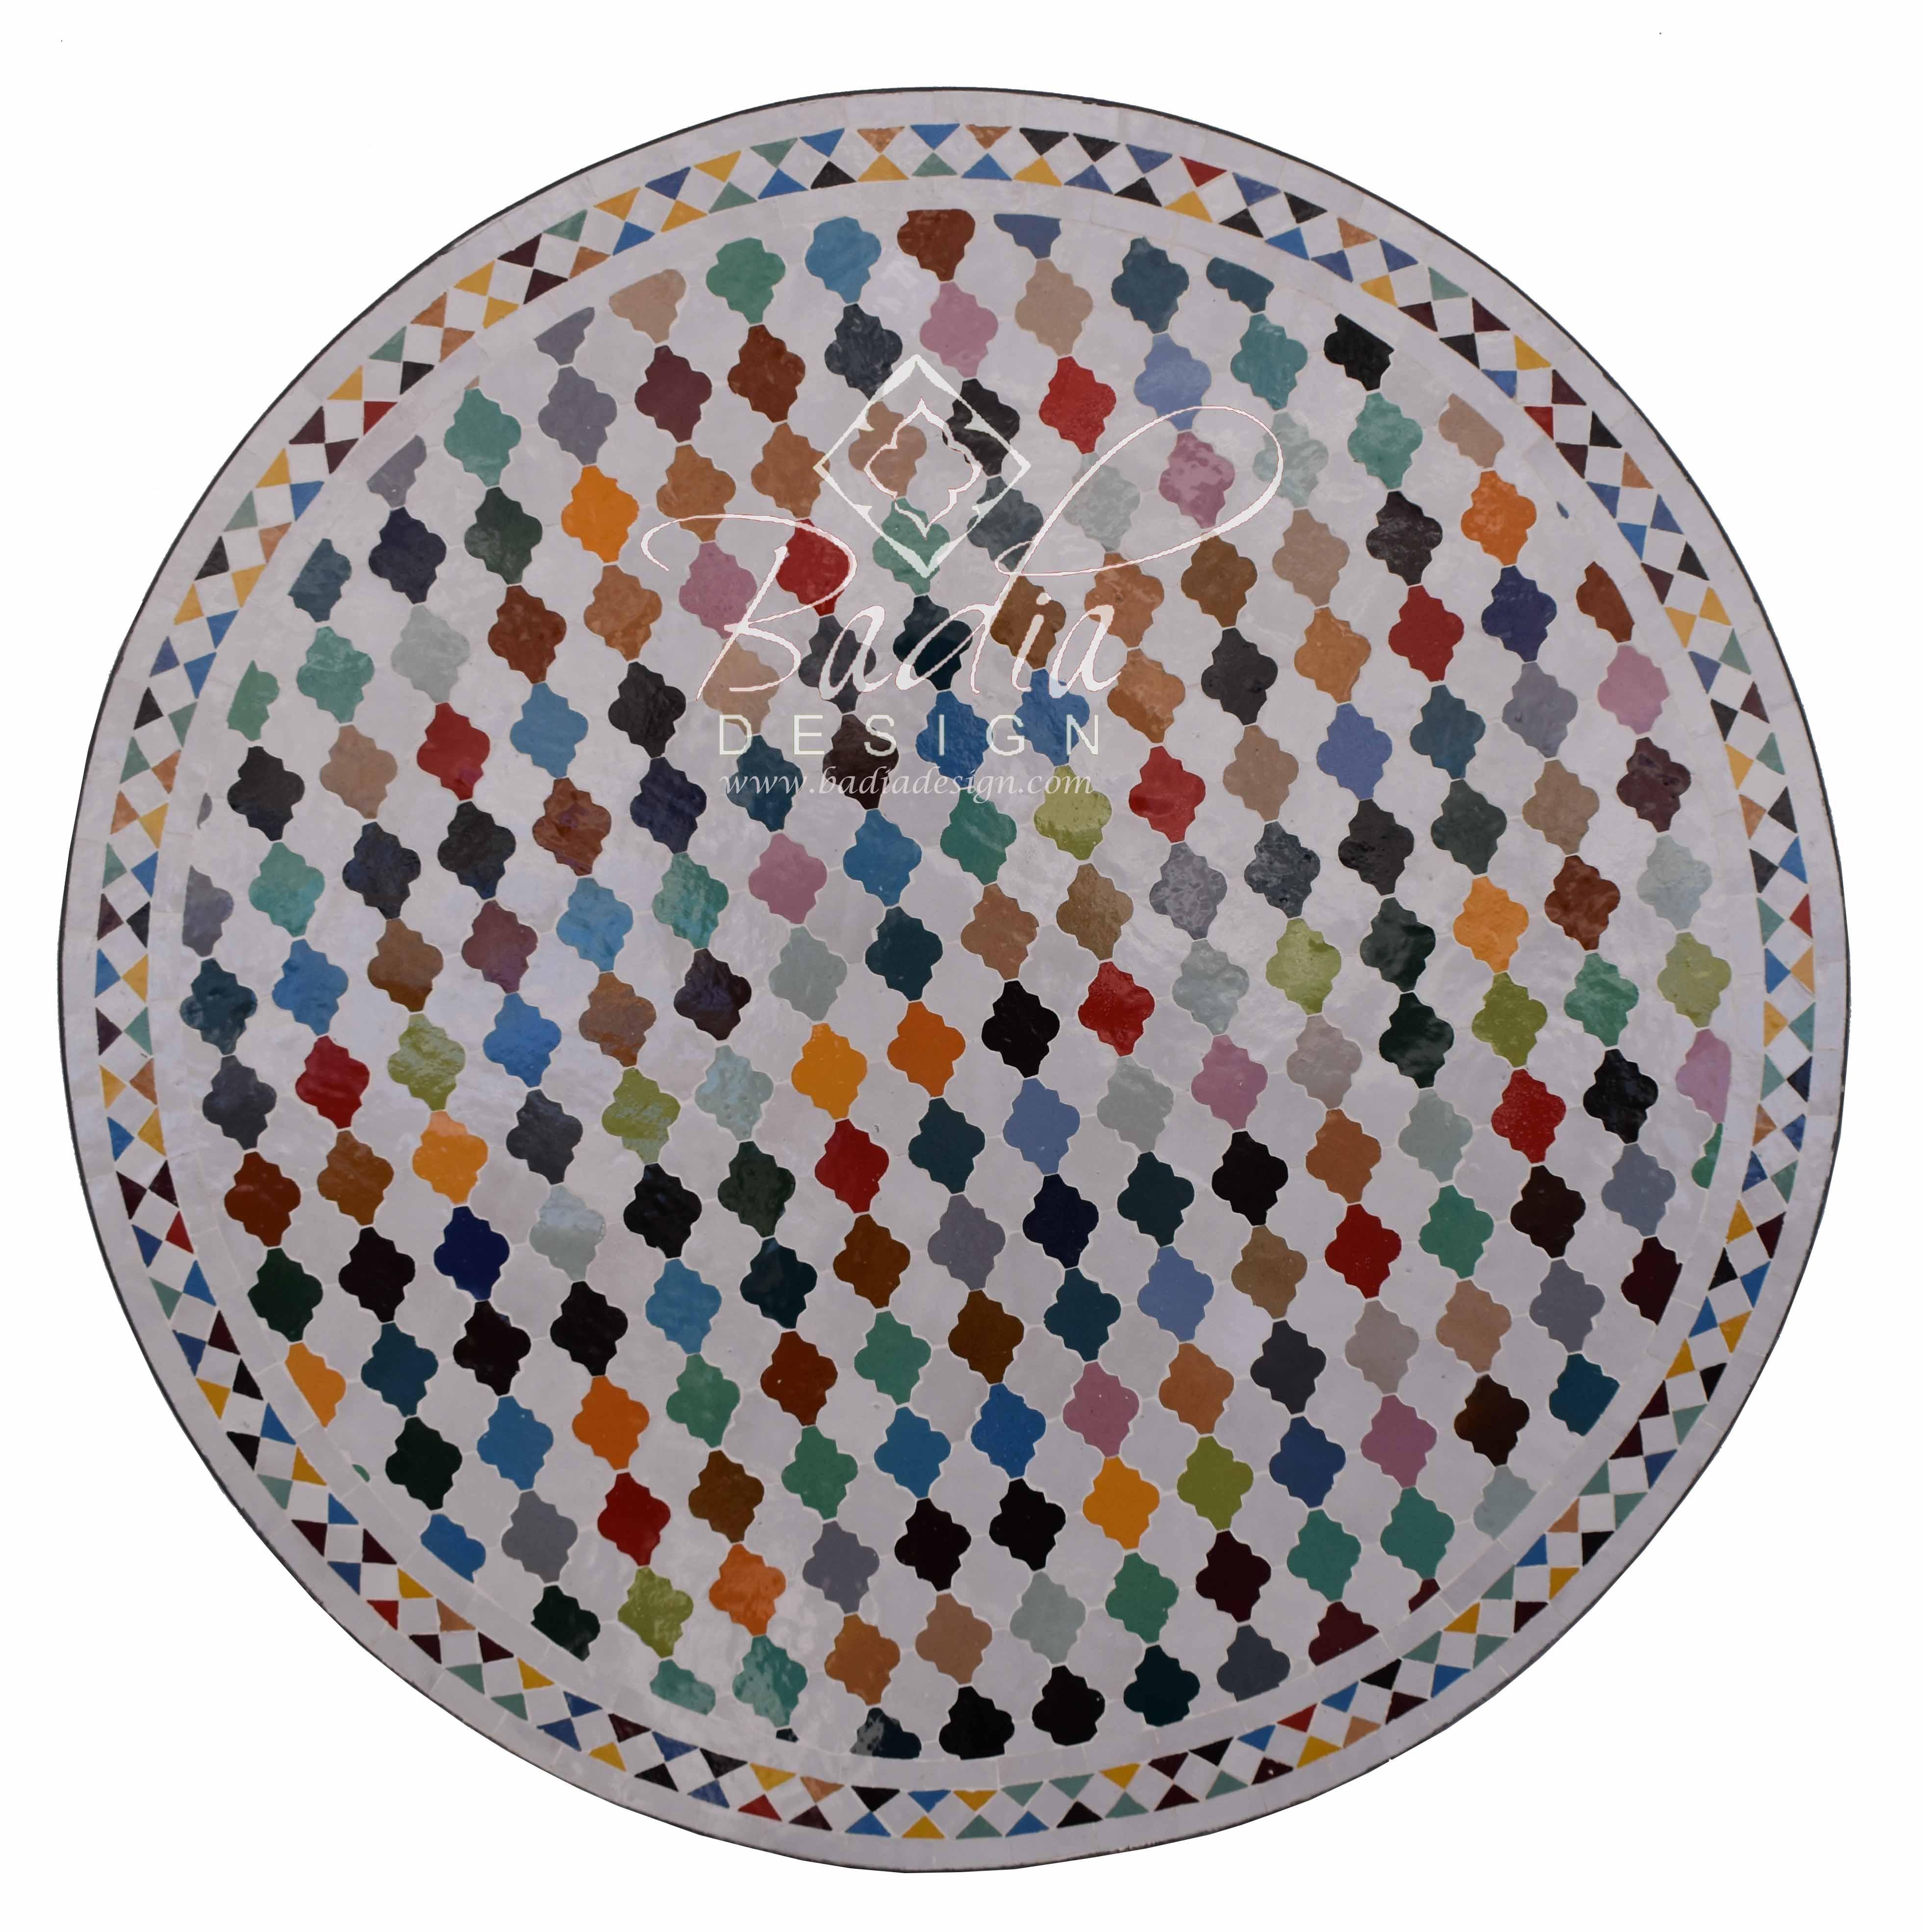 moroccan-tile-table-tops-los-angeles-mtr325.jpg